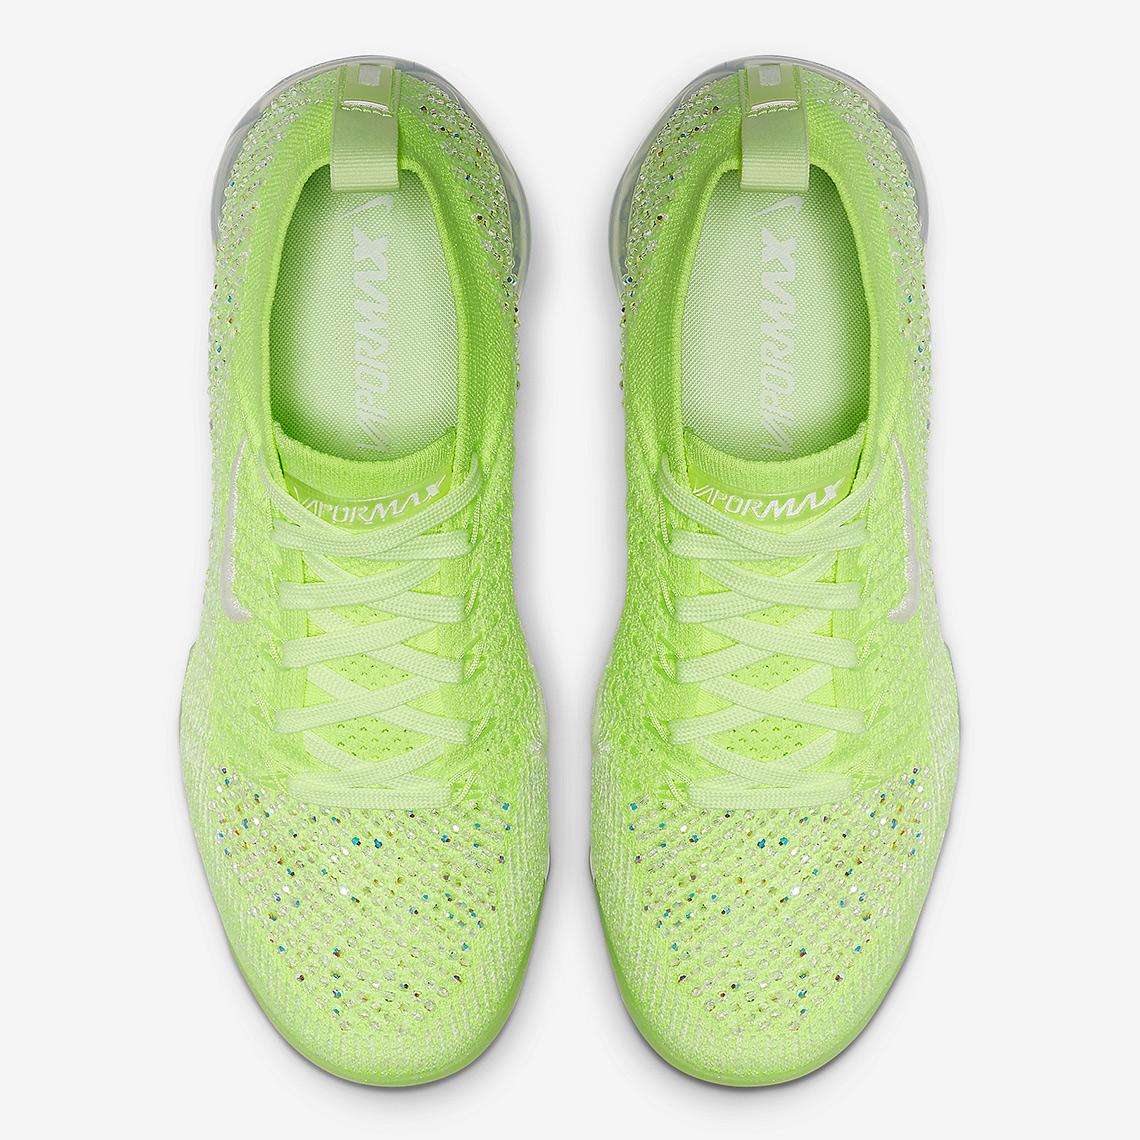 14110a84c9d Nike Vapormax 2.0 Swarovski AT5673-700 Release Info